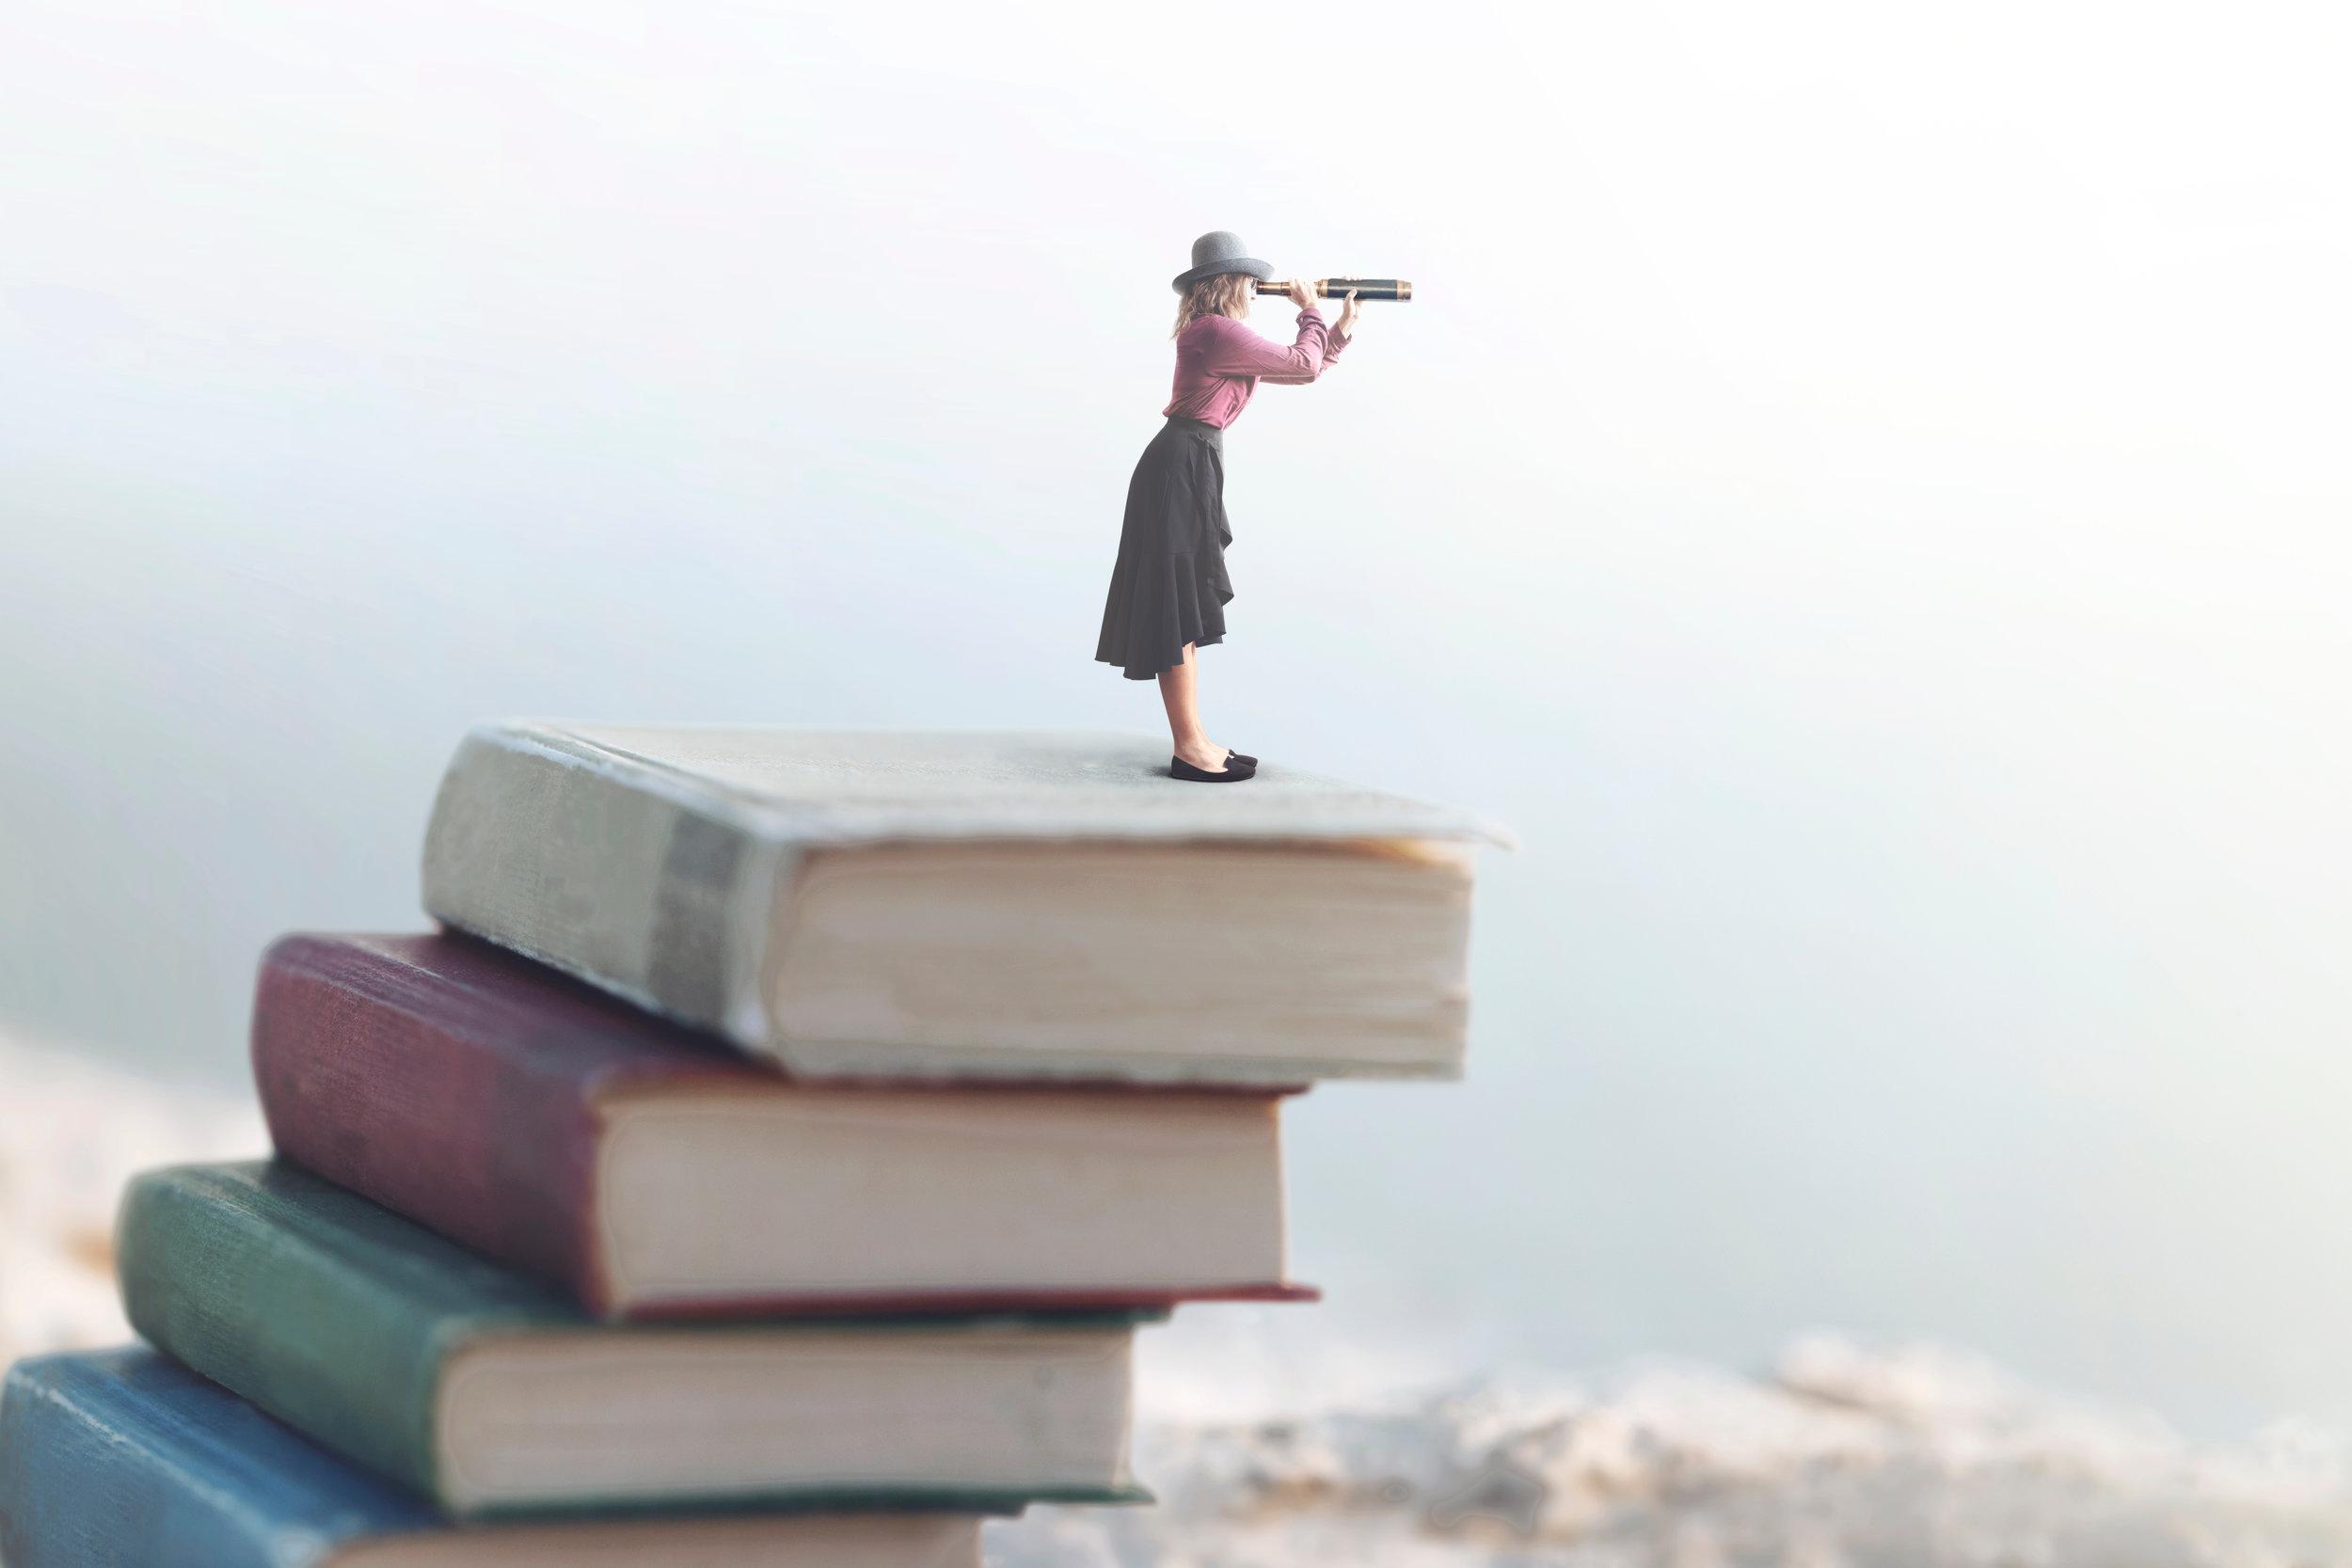 Woman Standing on Book.jpg